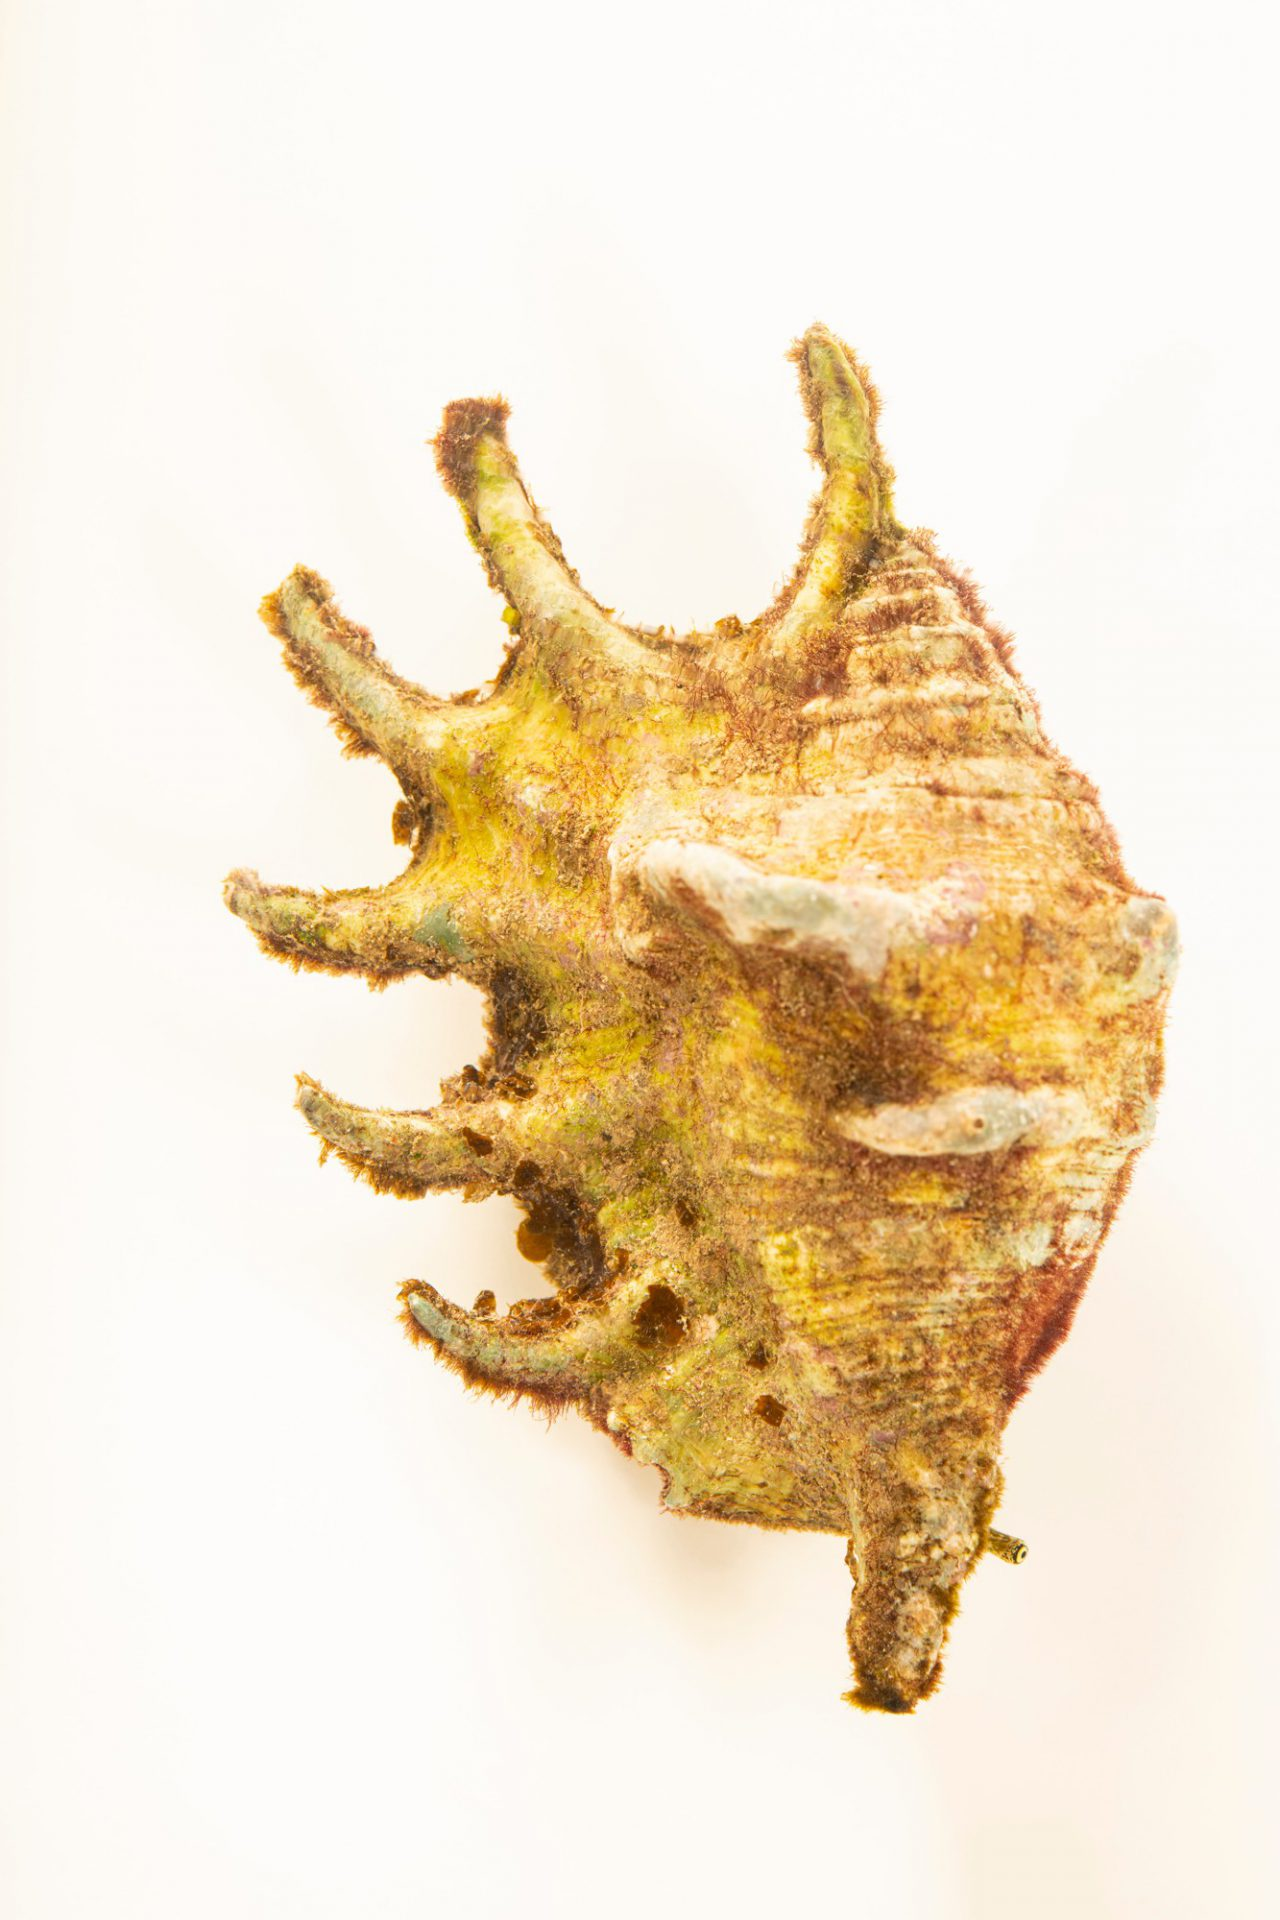 Photo: A spider conch (Lambis scorpius) at Semirara Marine Hatchery Laboratory in the Philippines.